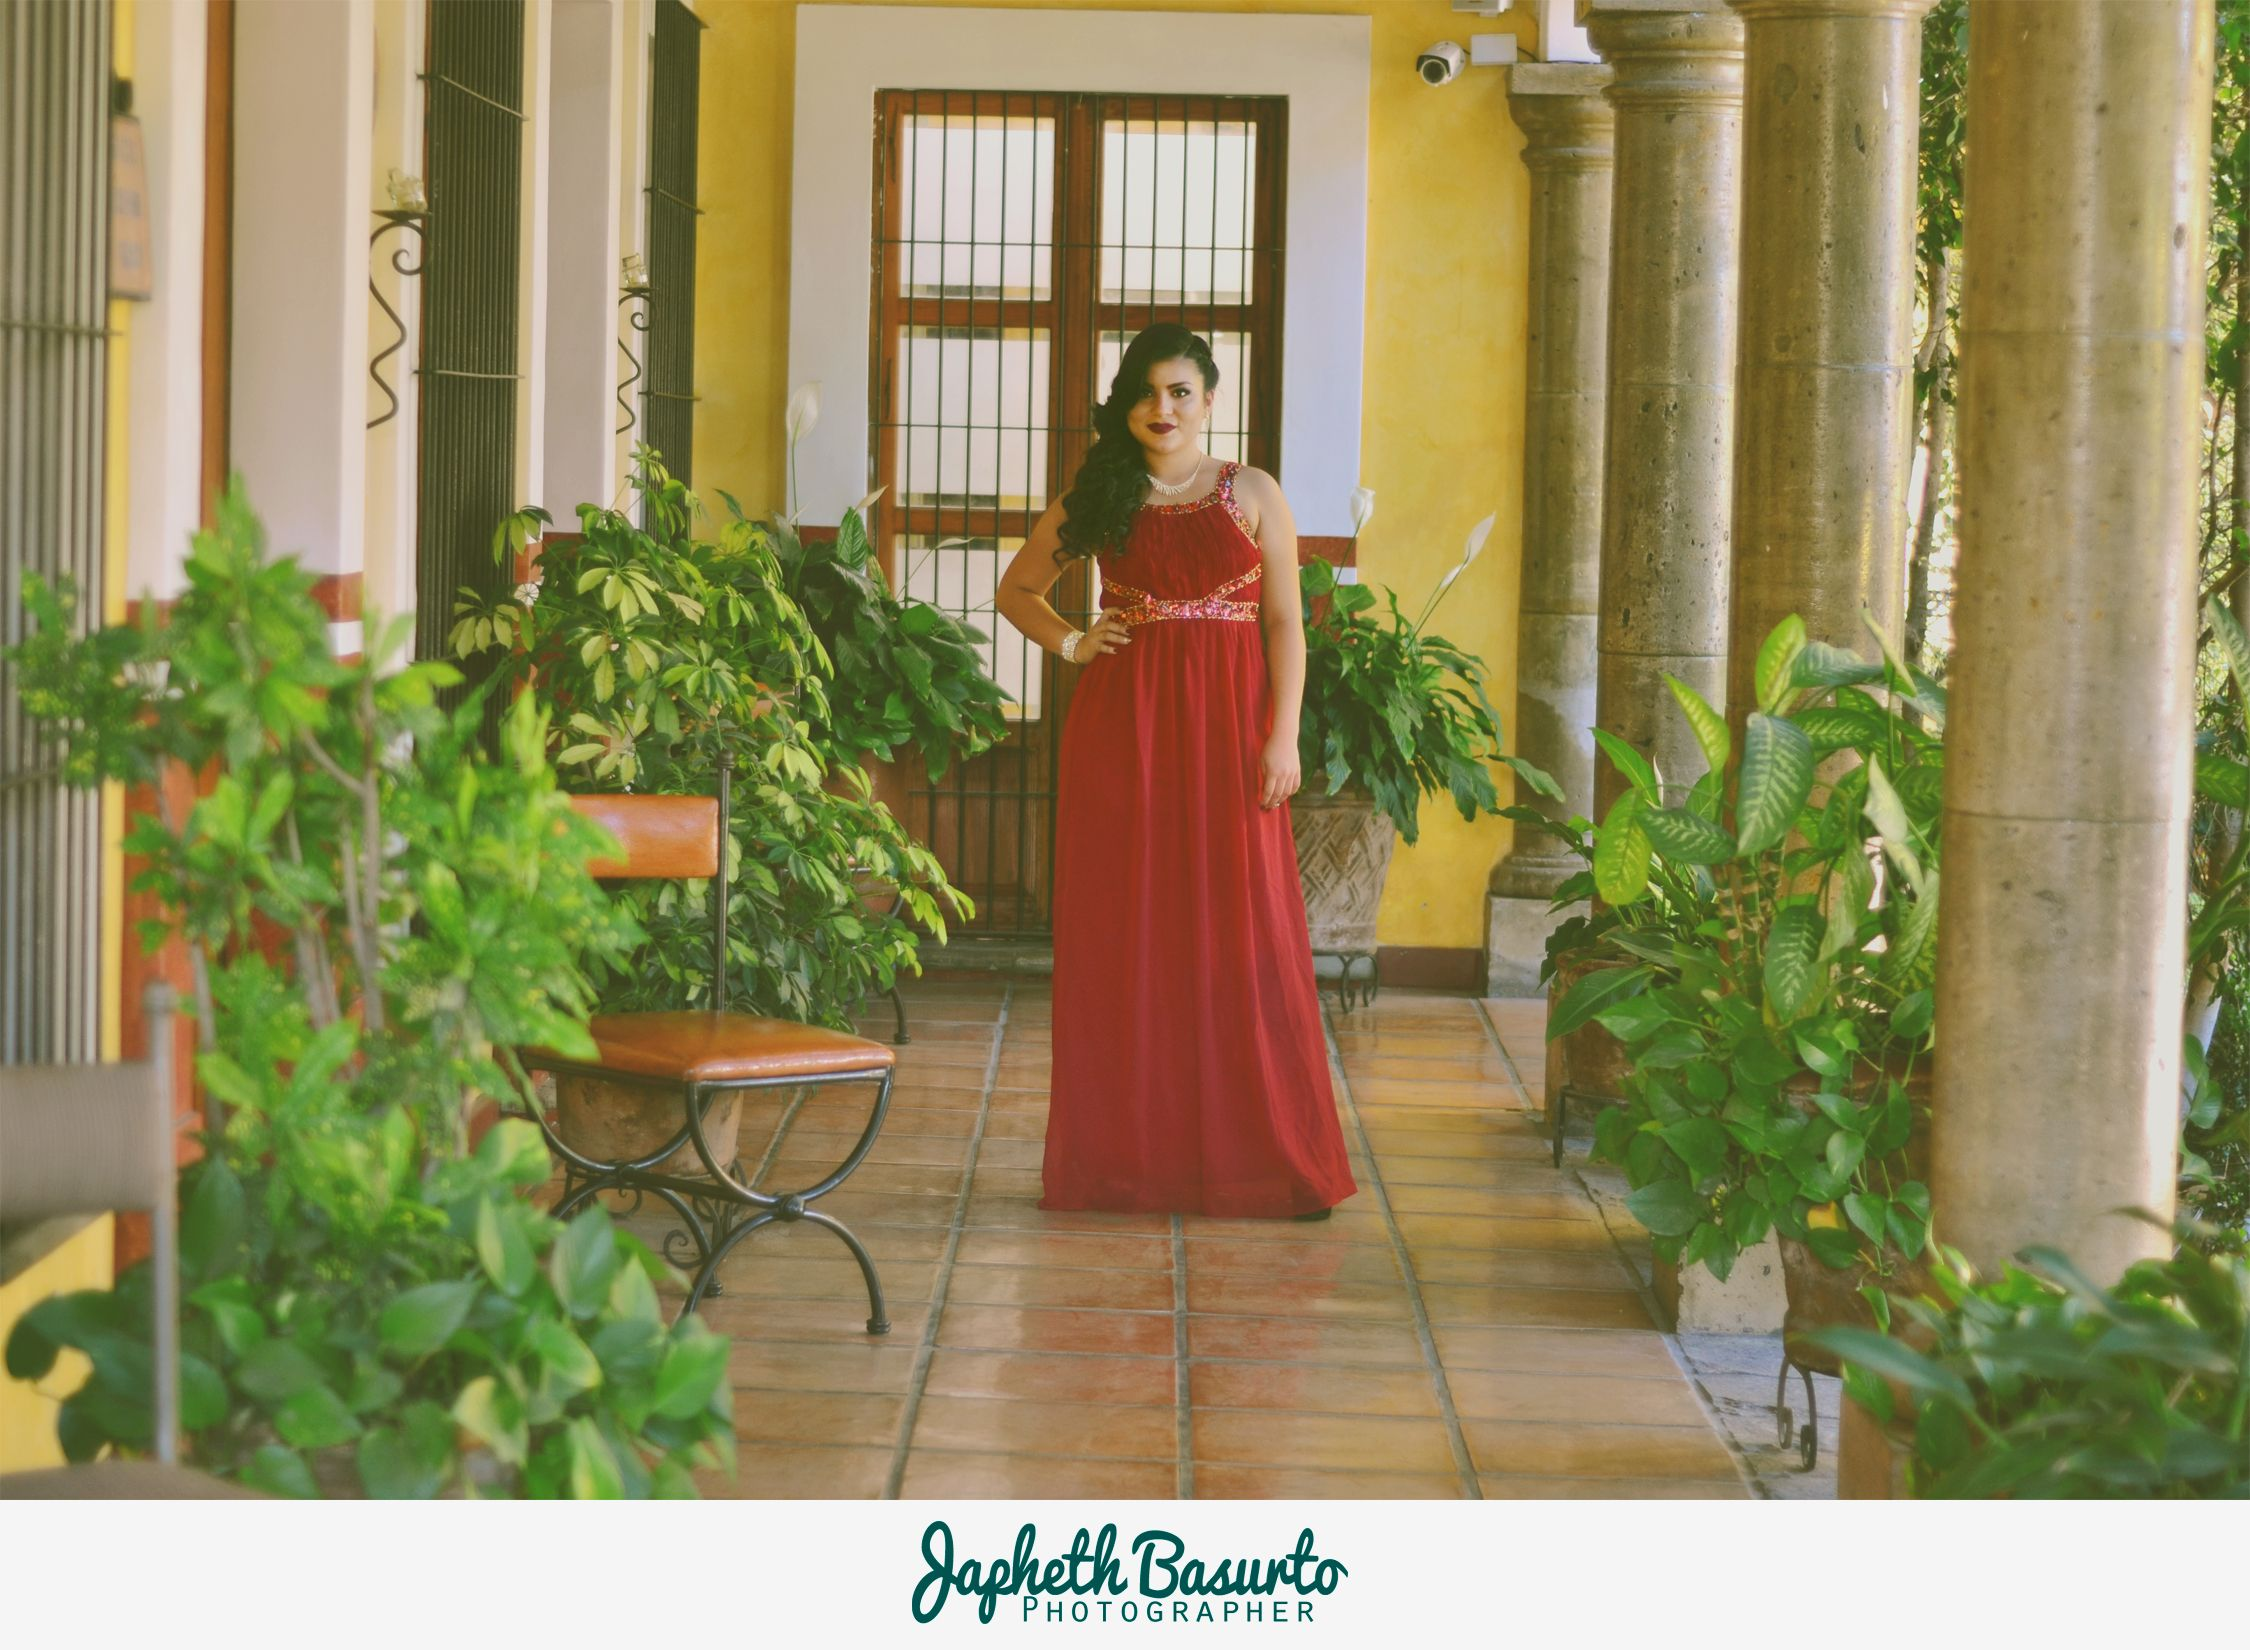 Hotel Casa de los Patios - Sayula, Jalisco #Model #Fashion #GEO #Red #JaphethBasurto #Day #Beautiful